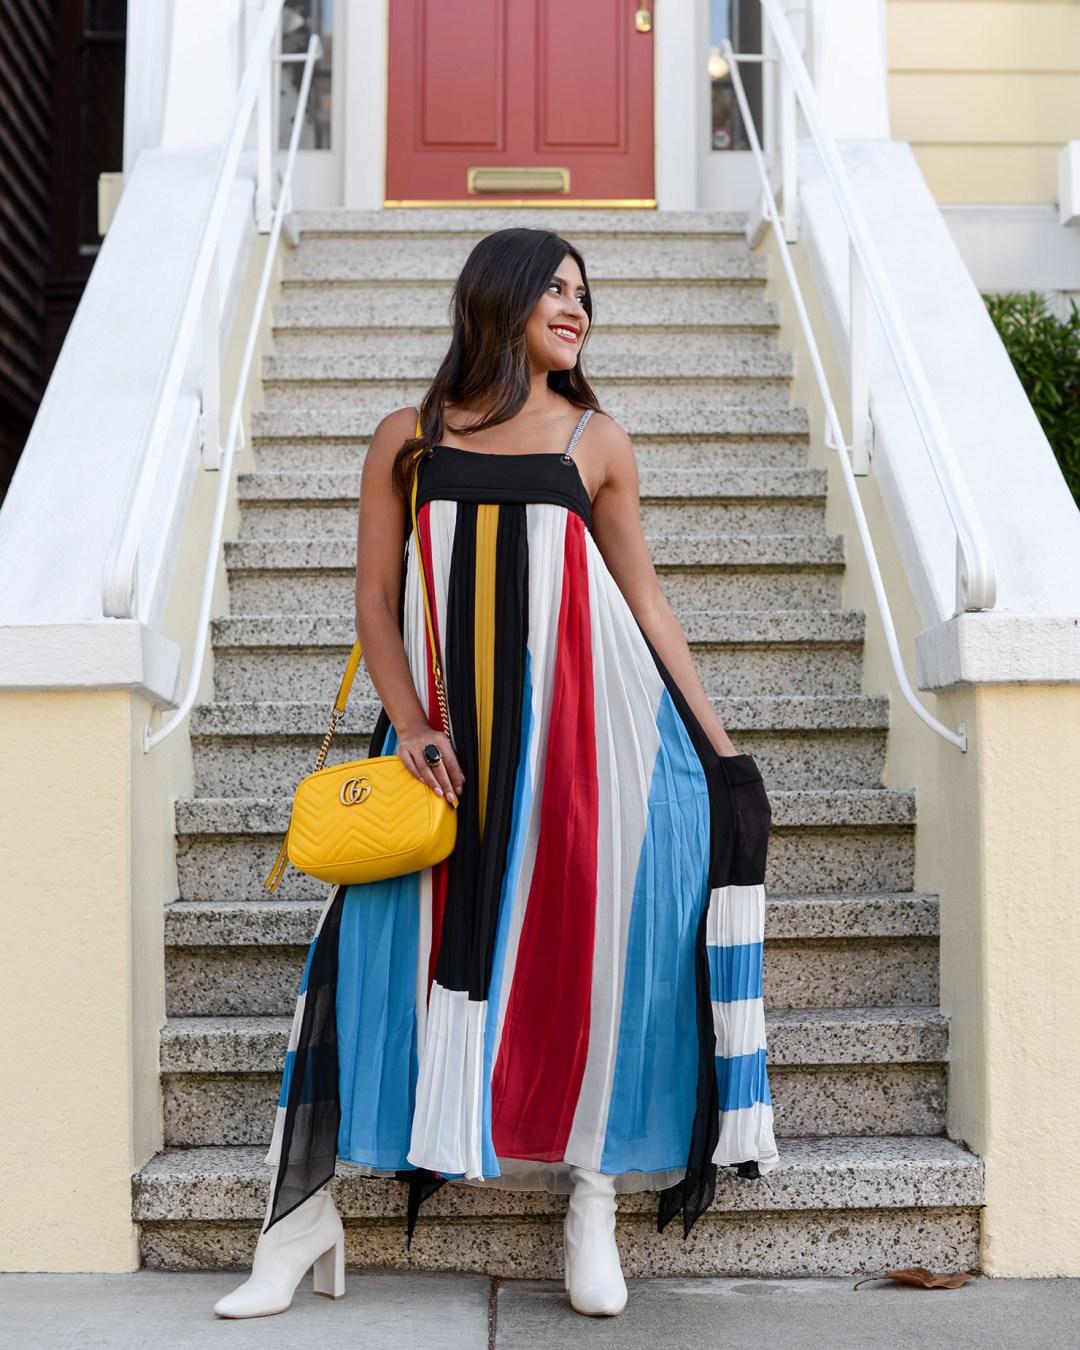 Life style blogger Kelsey Kaplan of Kelsey Kaplan Fashion wearing pleated maxi dress and white Stuart Weitzman booties